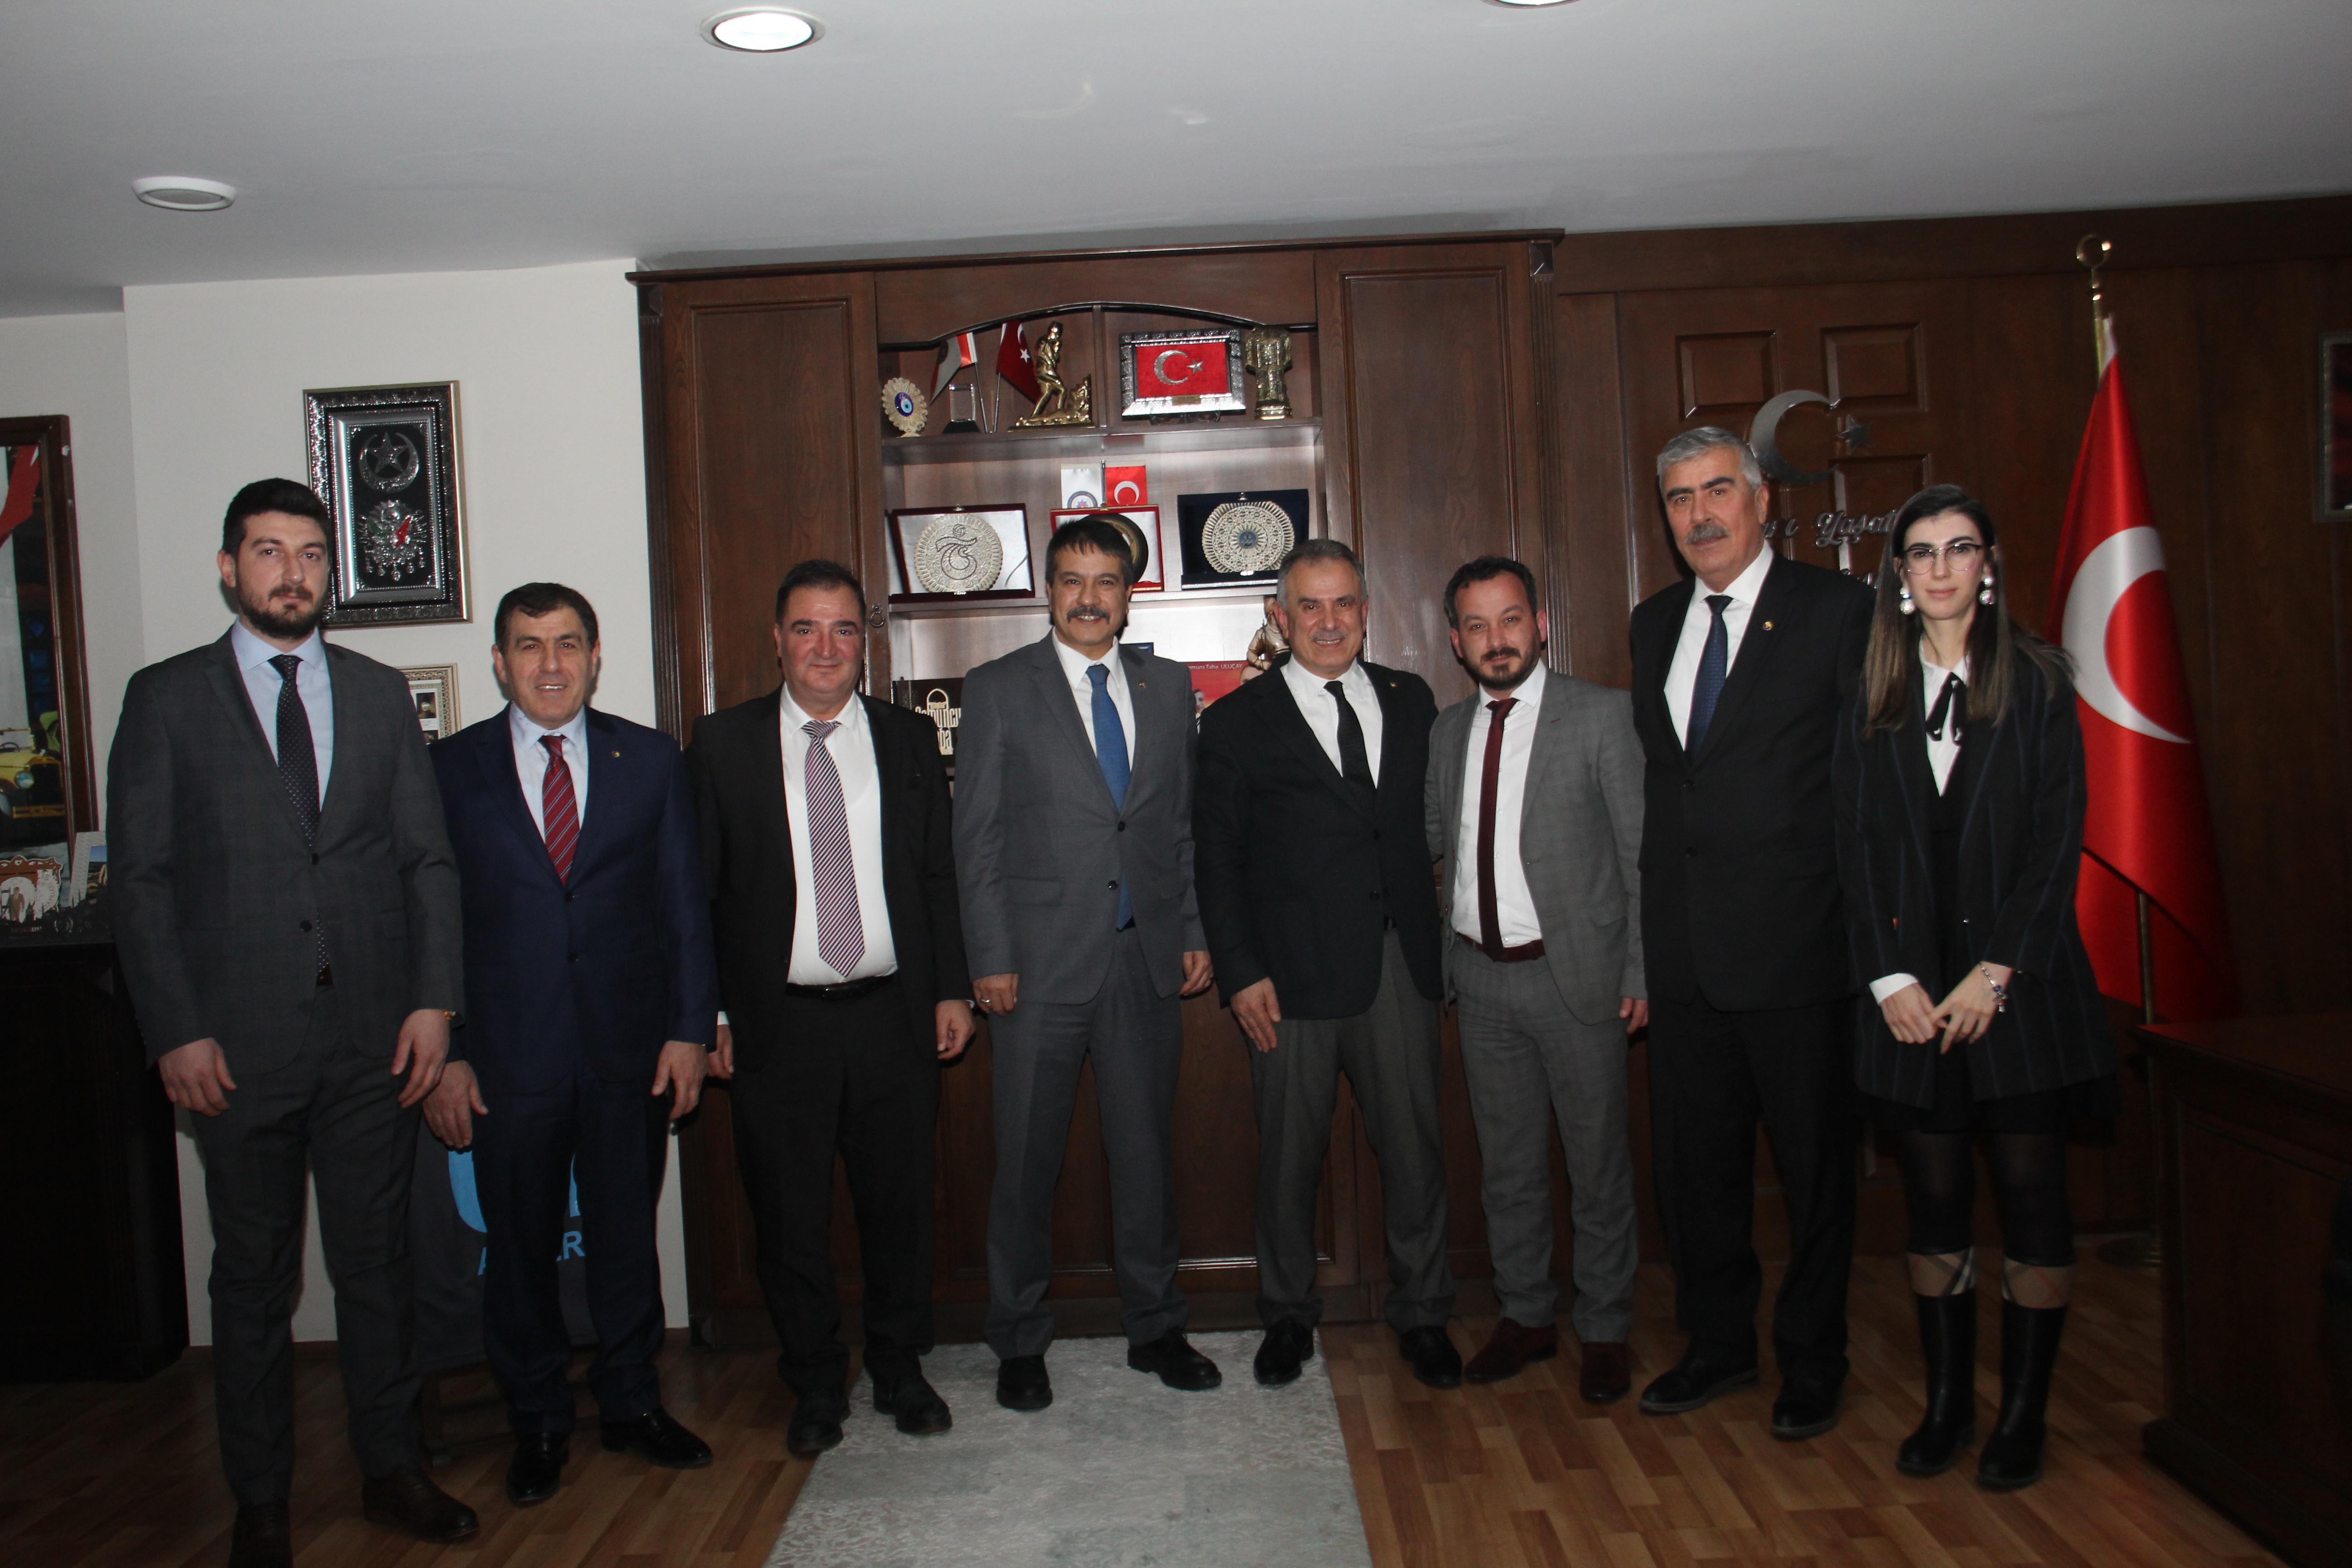 Borsa'dan Emniyet Müdürü Metin Alper'e ziyaret